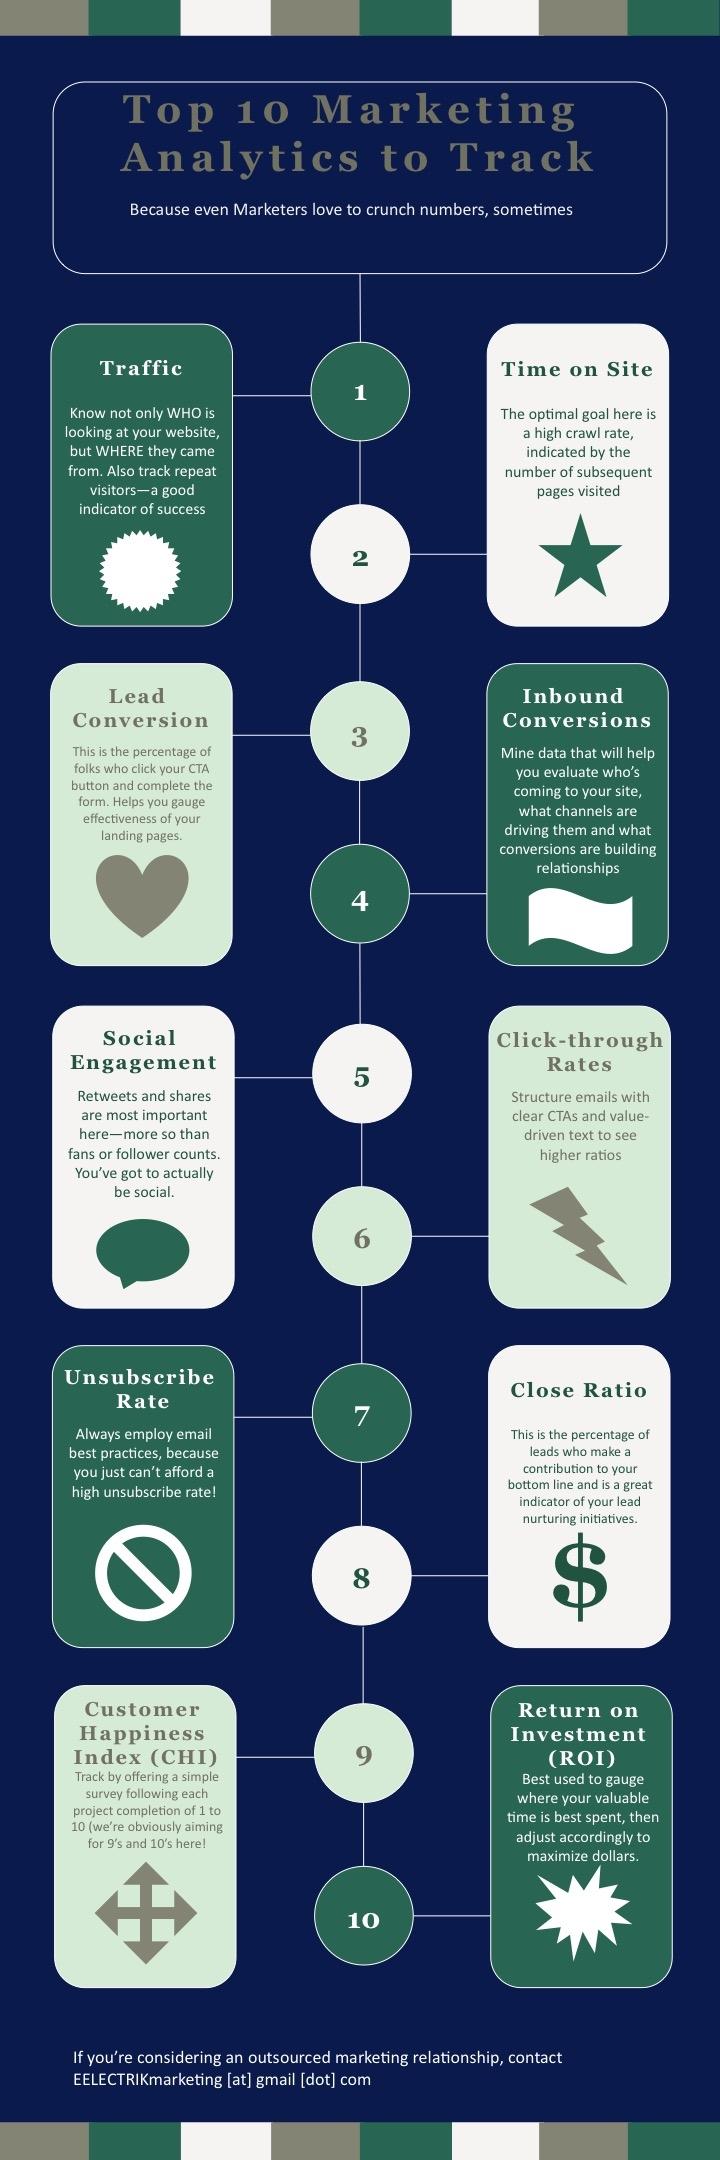 Top 10 Must-Track Marketing Analytics